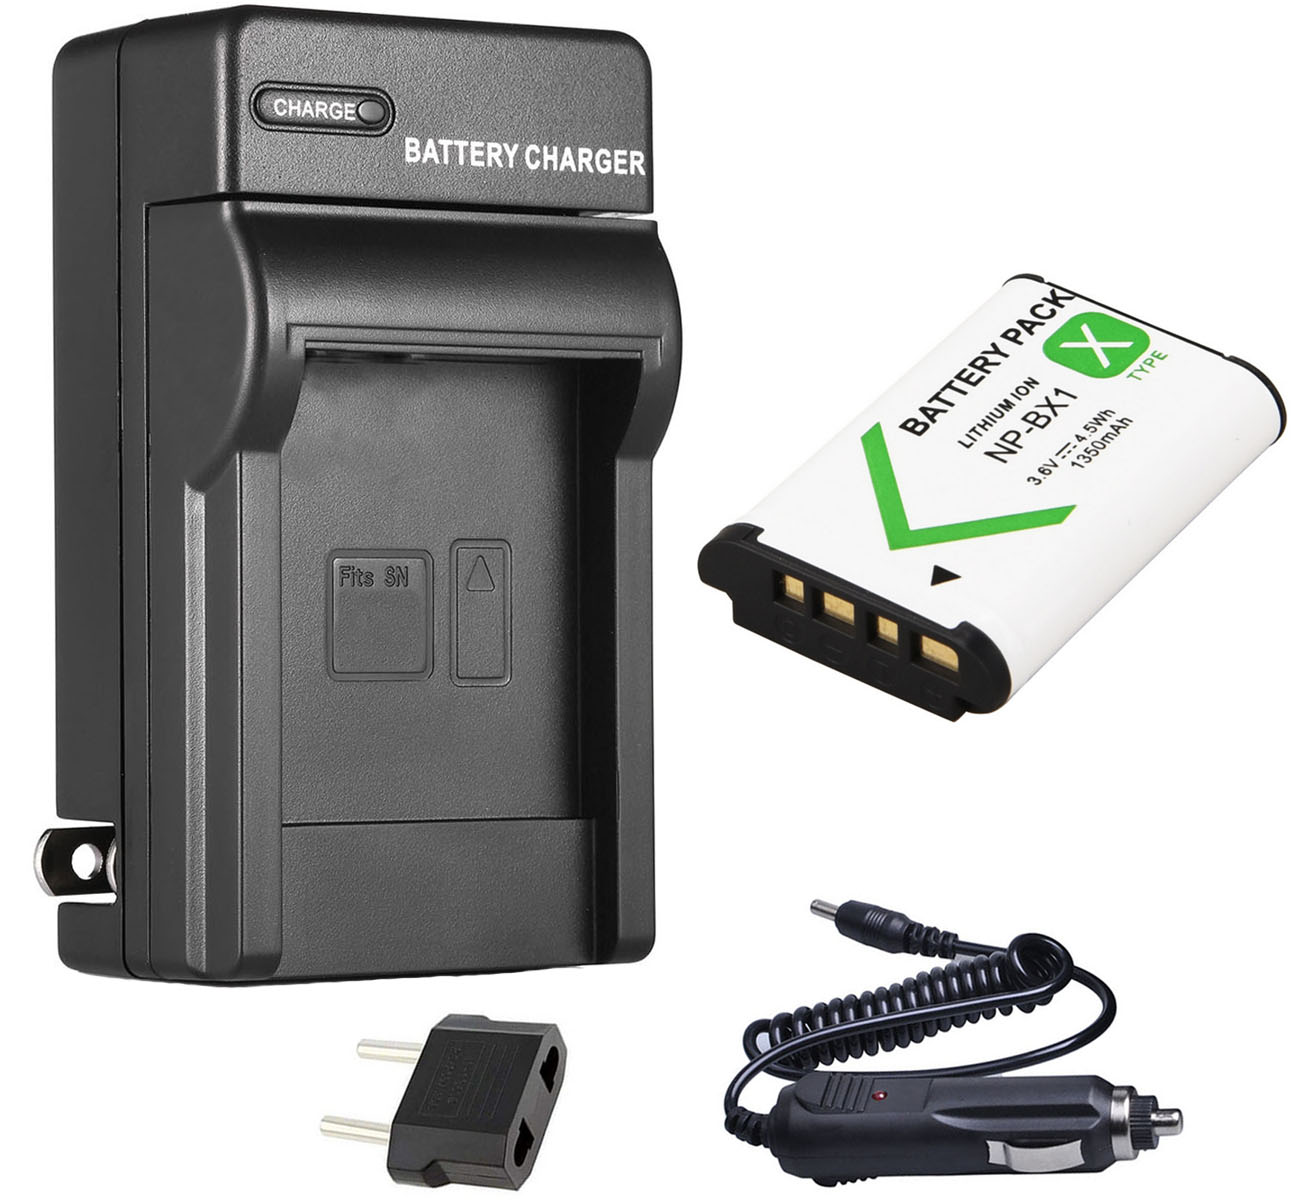 MICRO USB CHARGER for Sony Cybershot DSC-HX60V DSC-RX1R